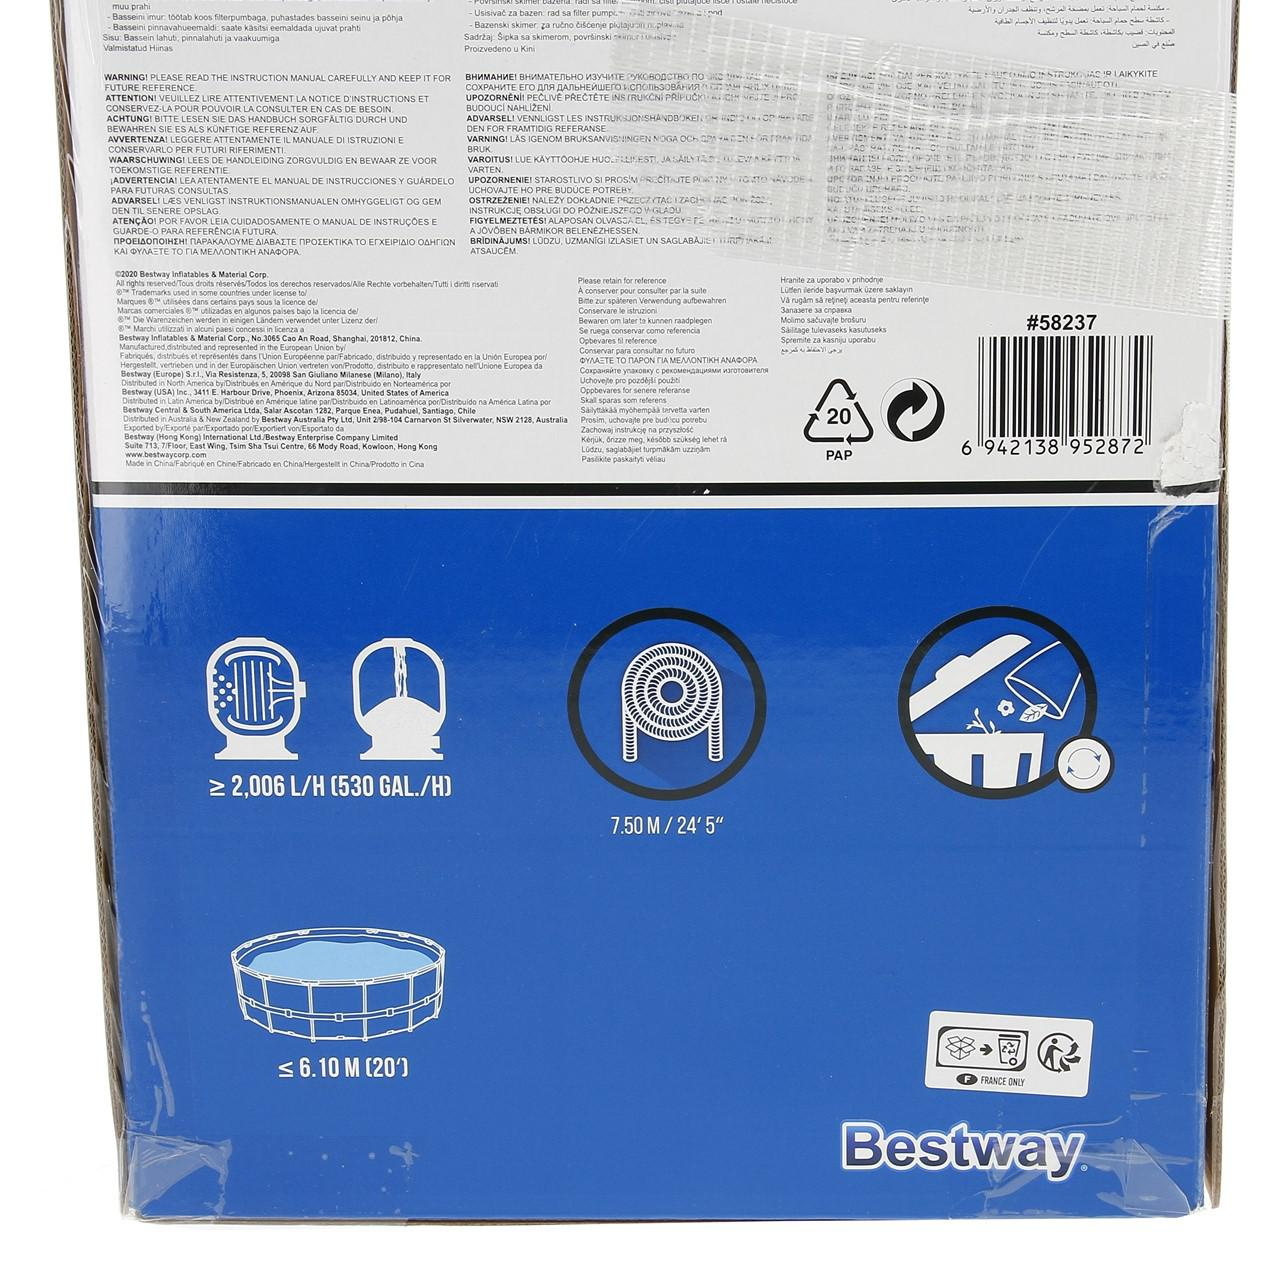 Kit nettoyage entretien piscine bestway kit entretient for Kit entretien piscine